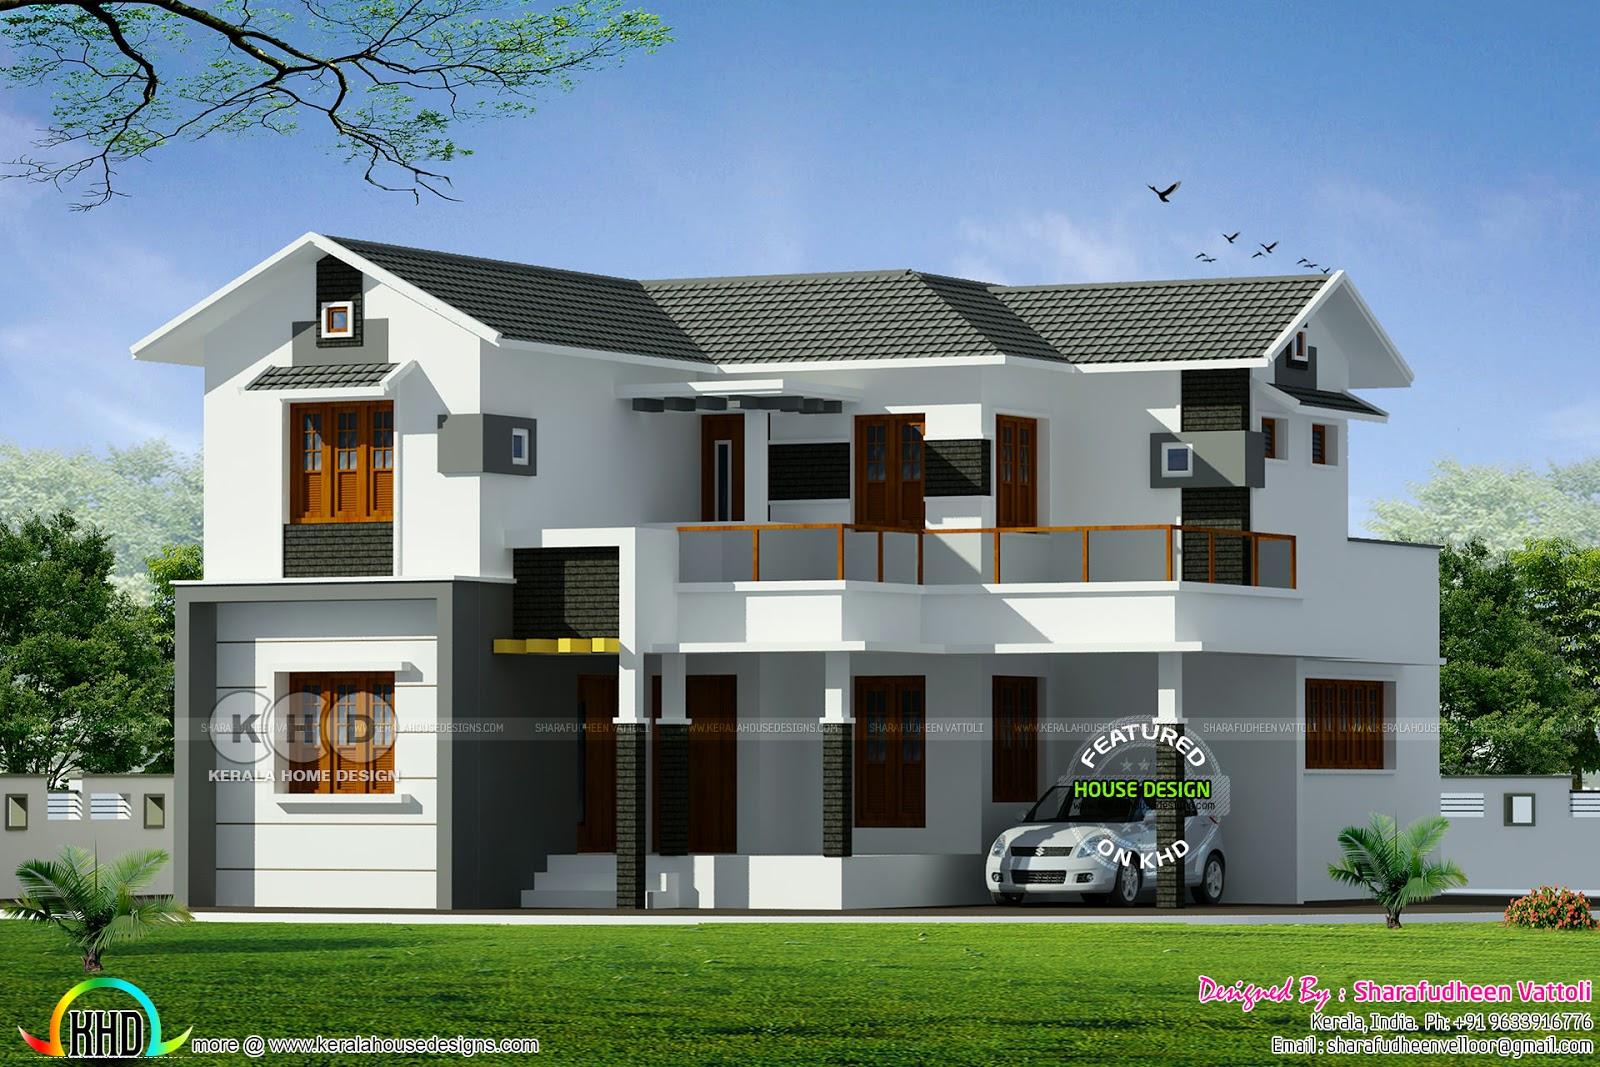 3 Different Home Designs One Floor Plan